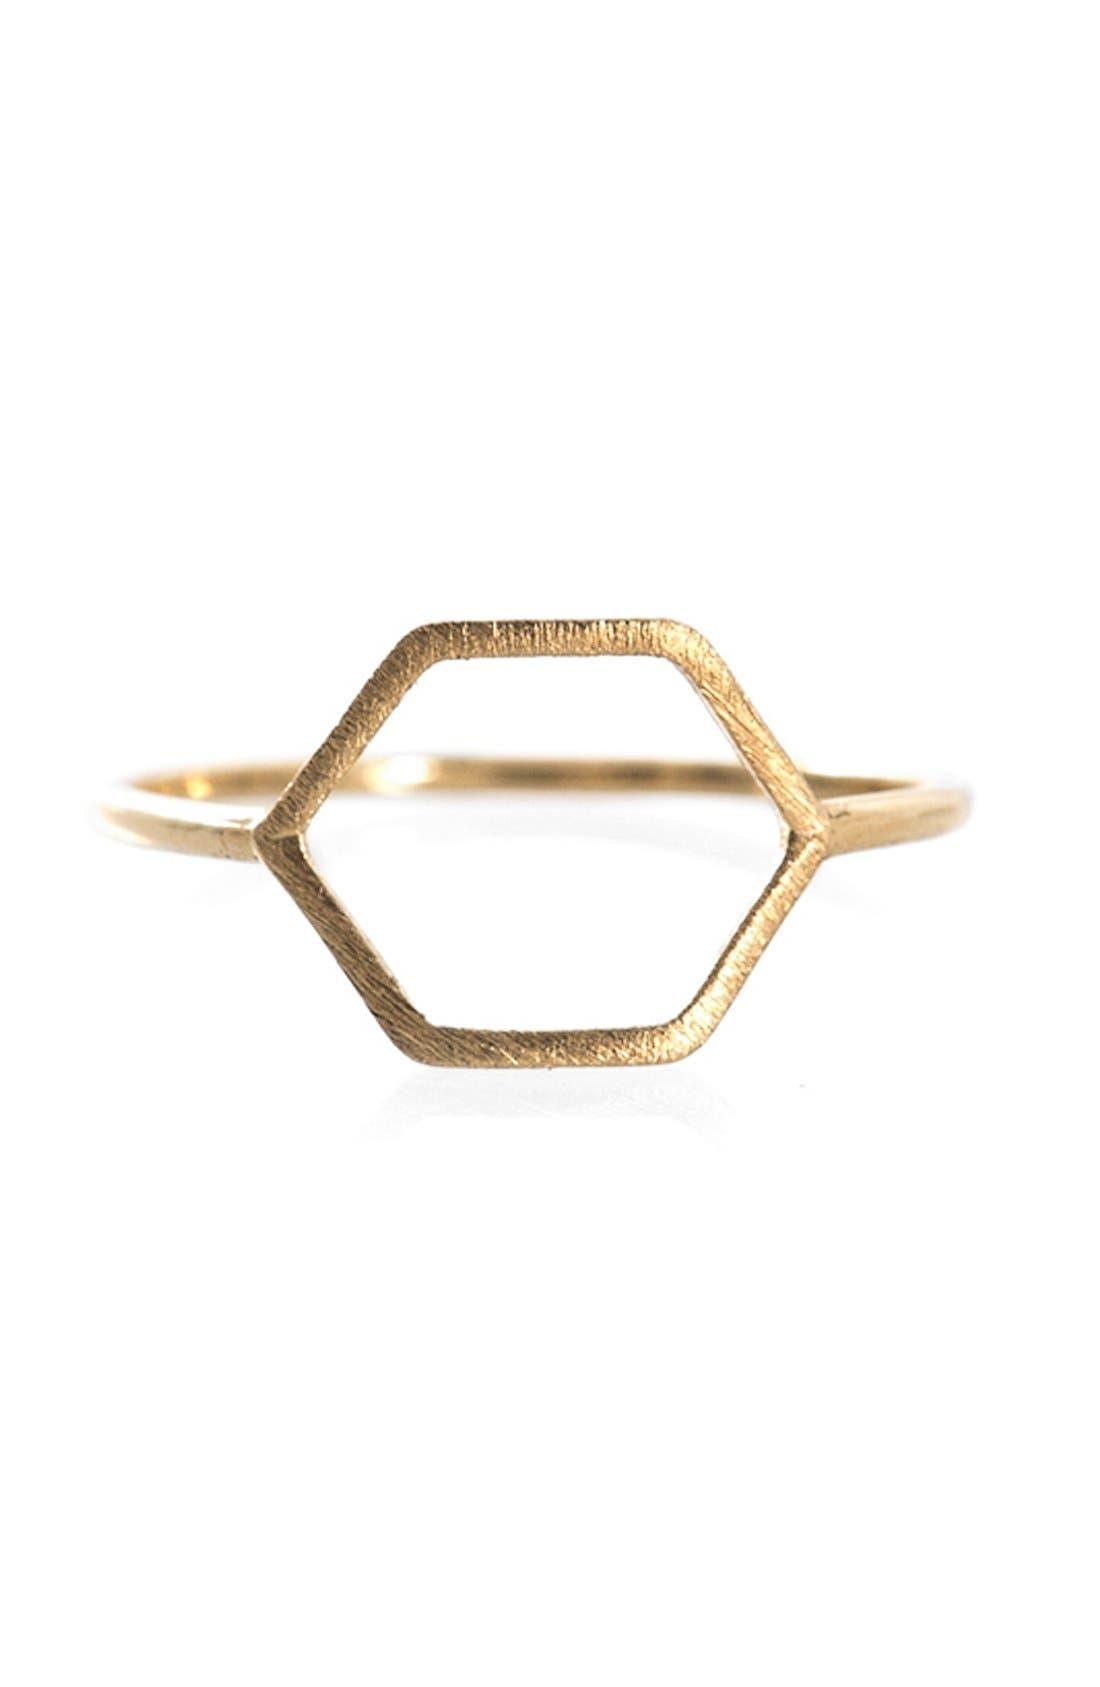 Alternate Image 1 Selected - Wanderlust + Co Hexagon Ring